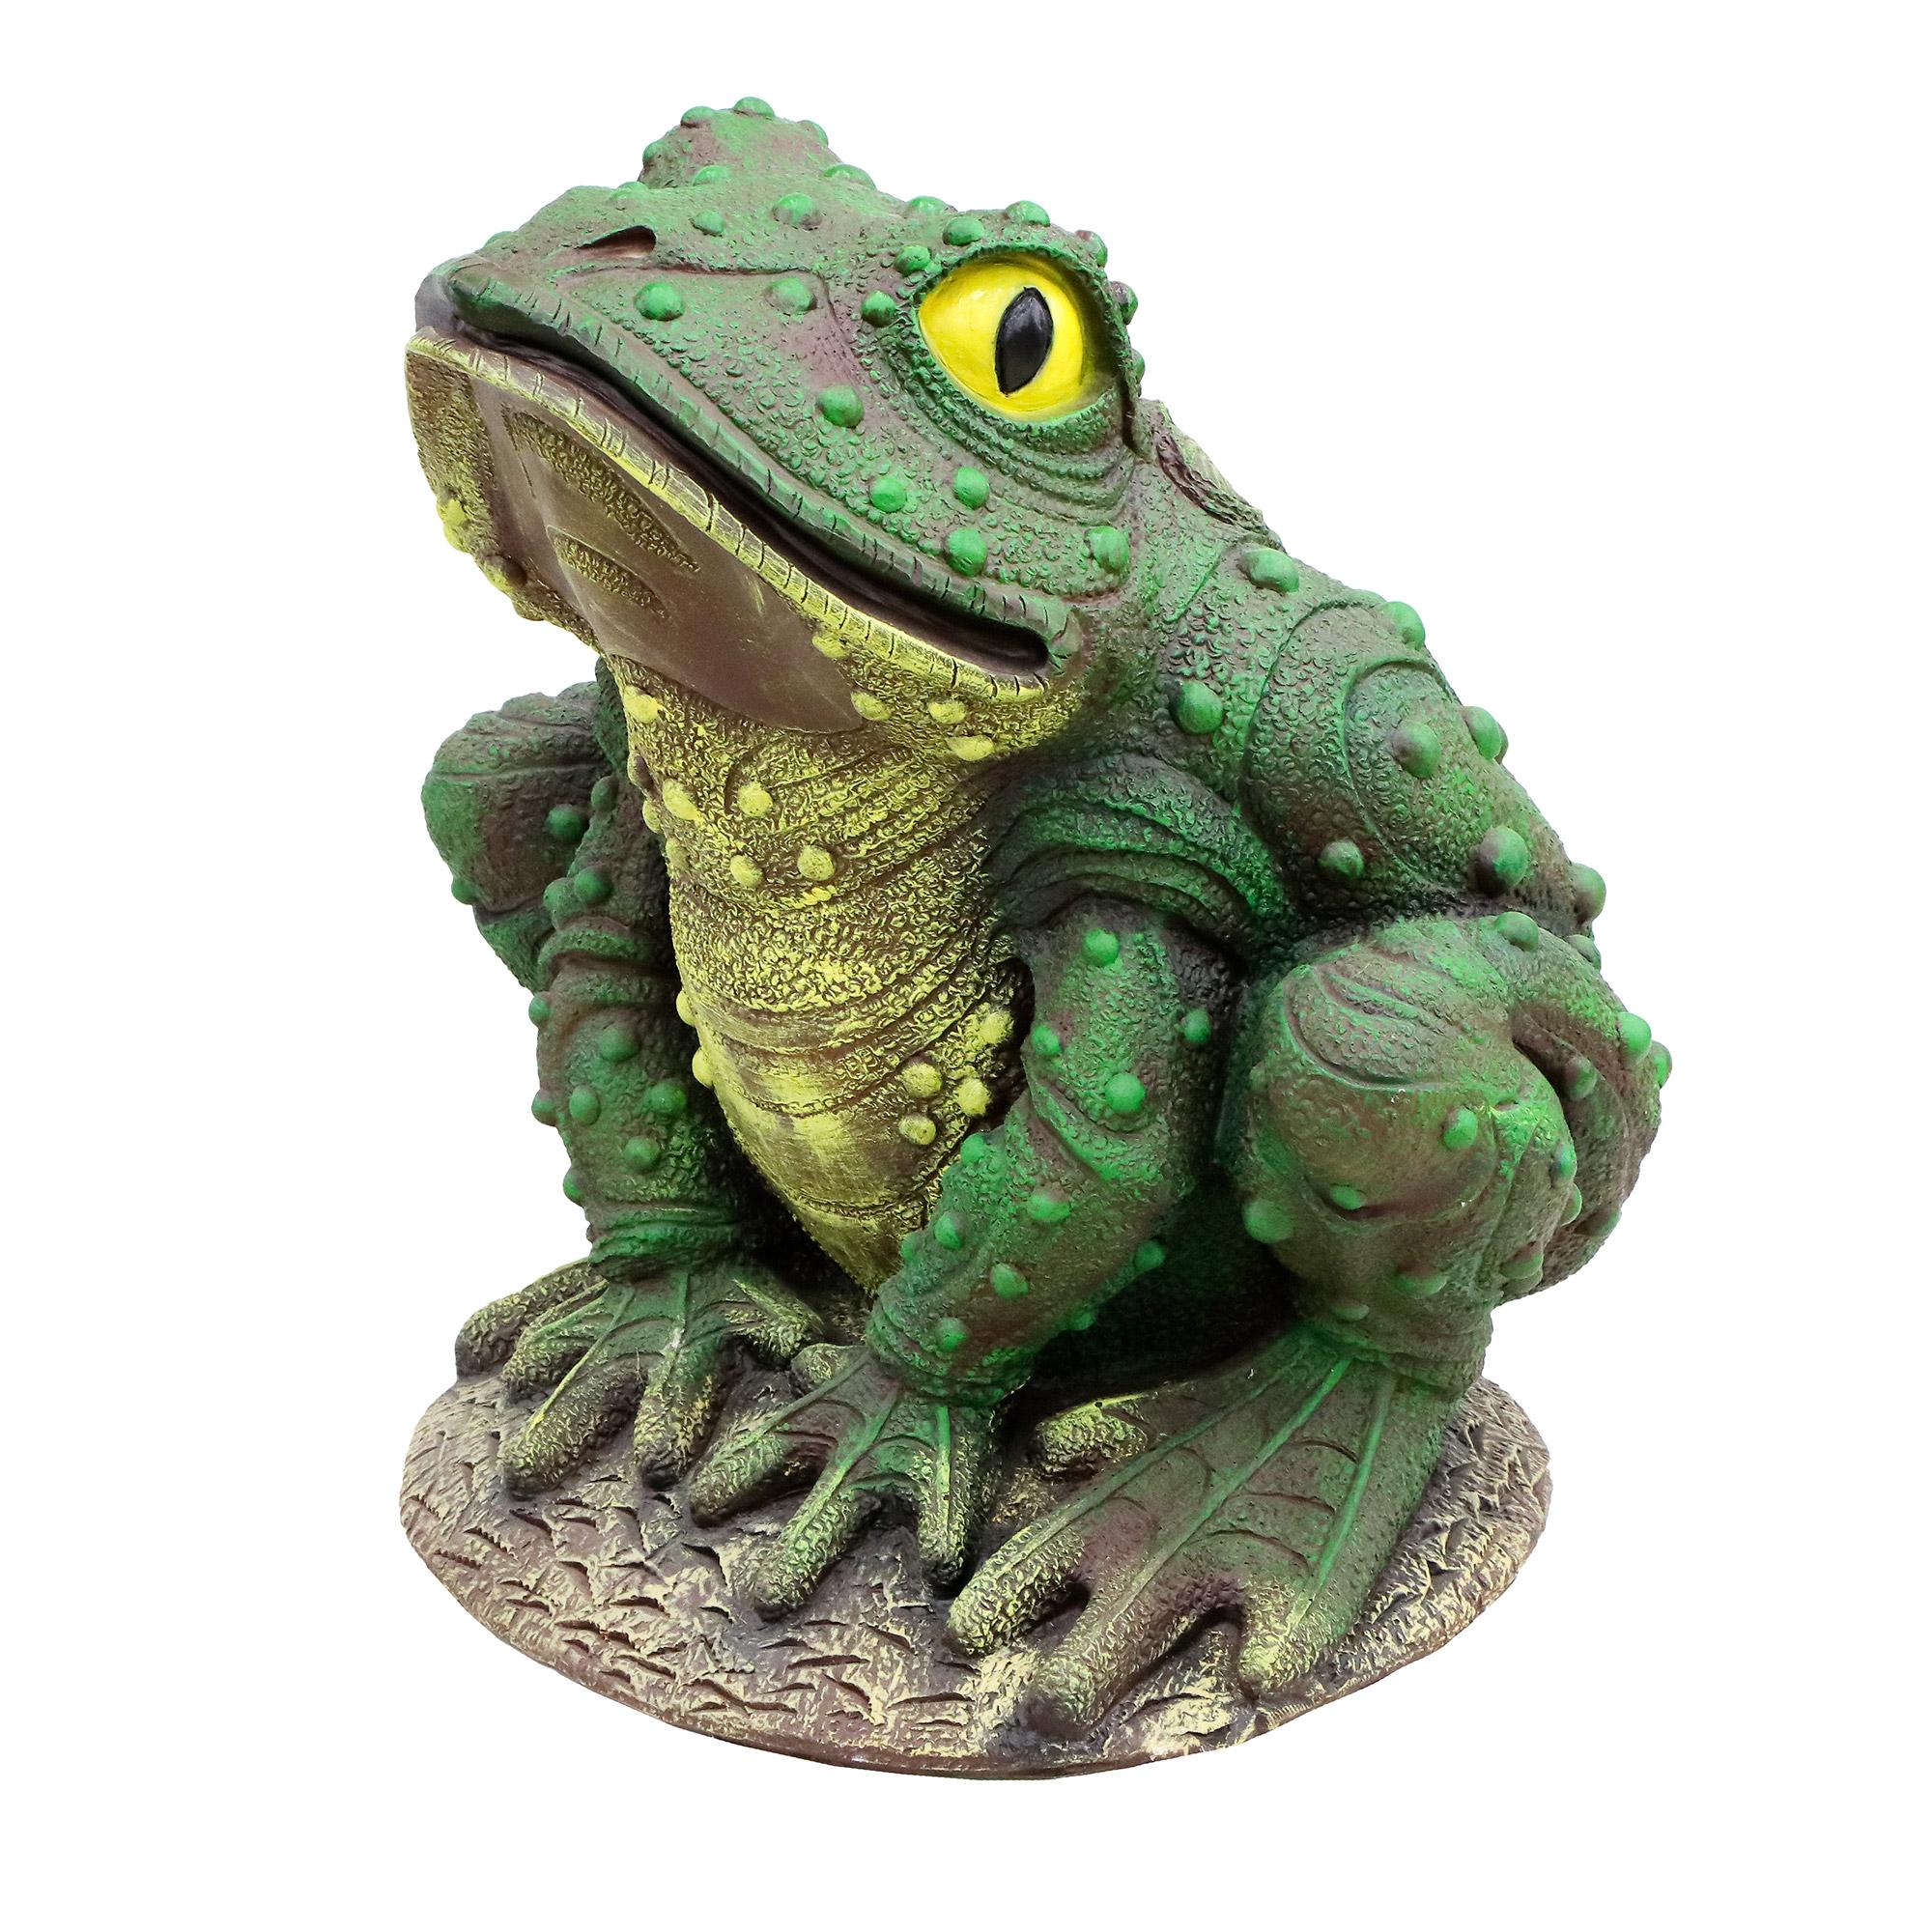 Лягушка-великан 70см Тпк полиформ